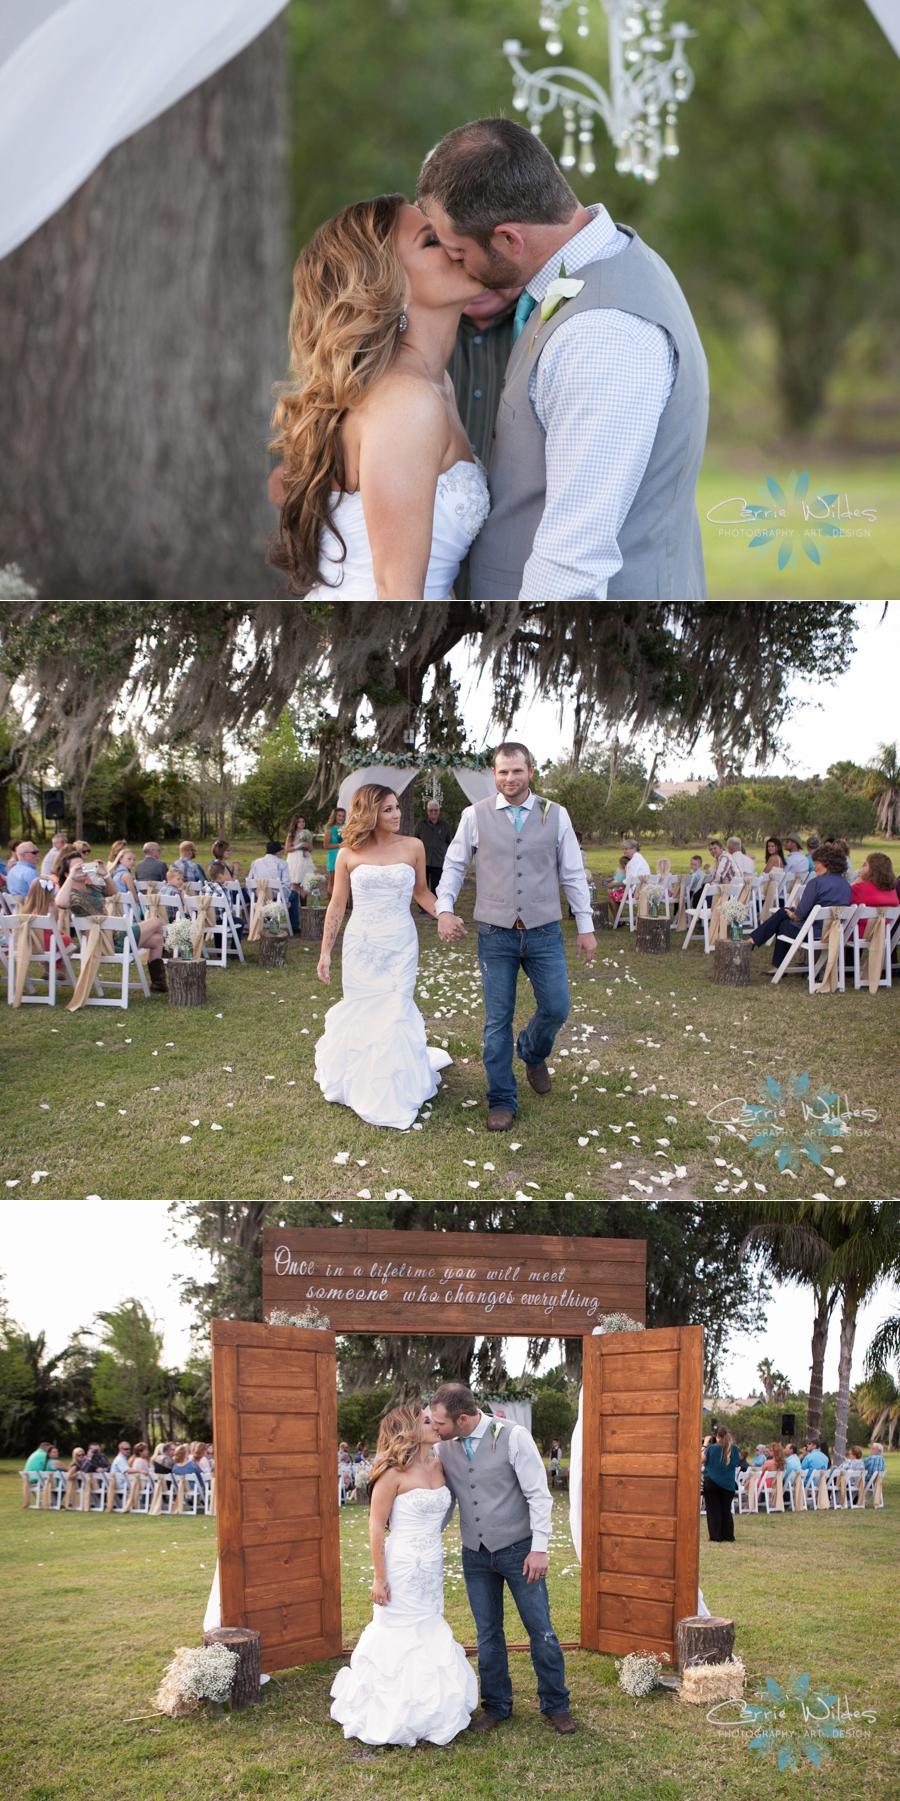 4_16_16 Plant City Rustic Chic Wedding_0011.jpg